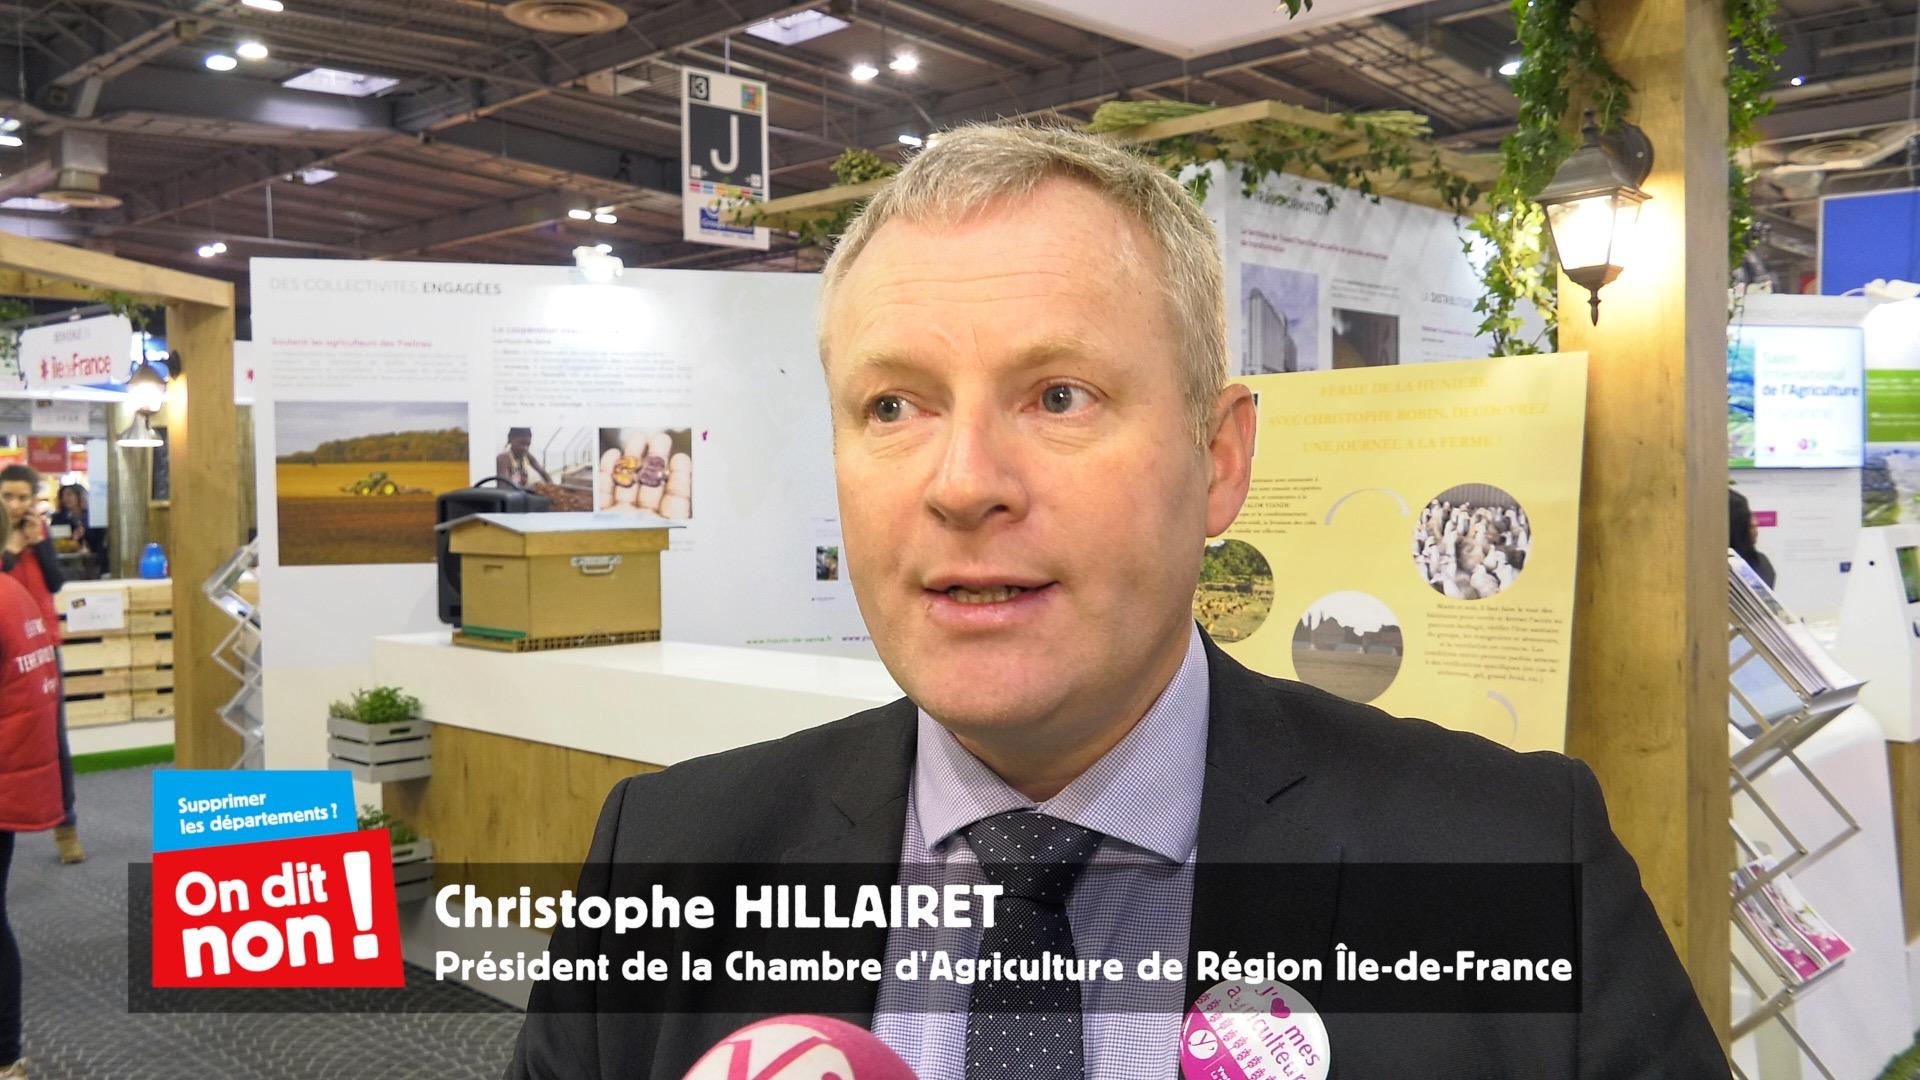 20180227_itv-hillairet_paris_vignette